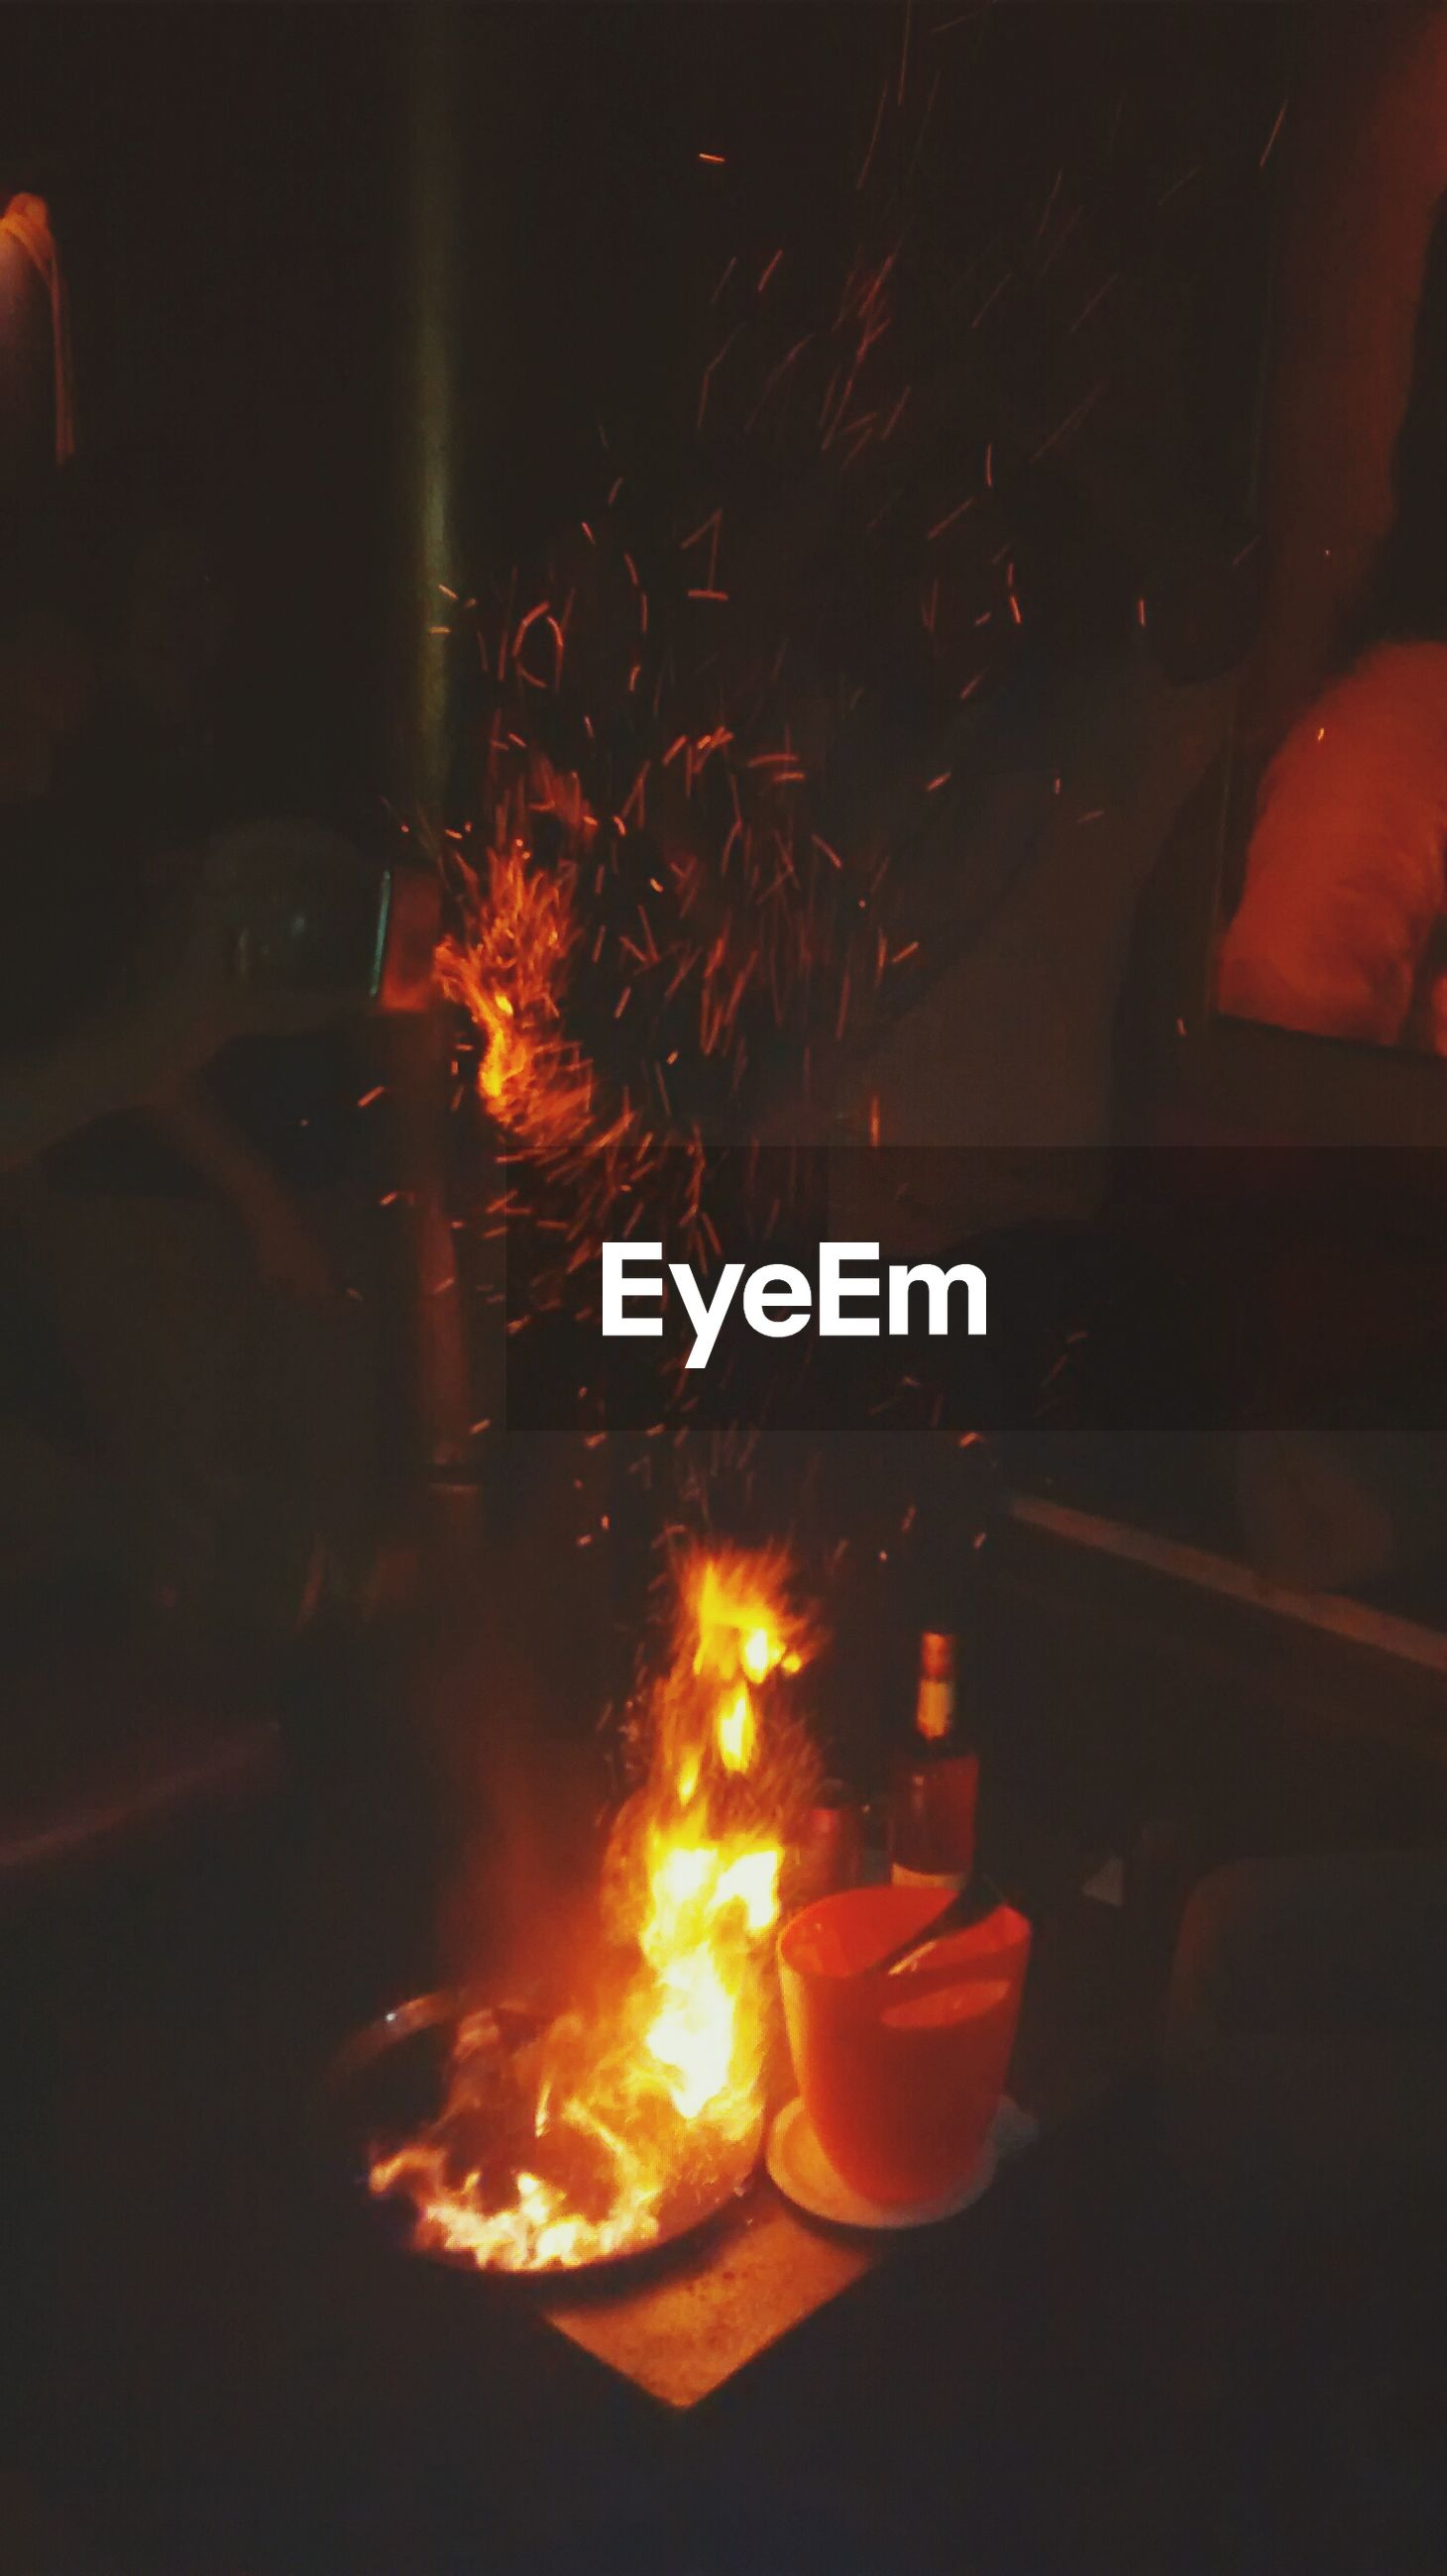 burning, fire - natural phenomenon, flame, heat - temperature, night, bonfire, glowing, fire, illuminated, firewood, campfire, heat, motion, orange color, dark, long exposure, light - natural phenomenon, smoke - physical structure, fireplace, close-up